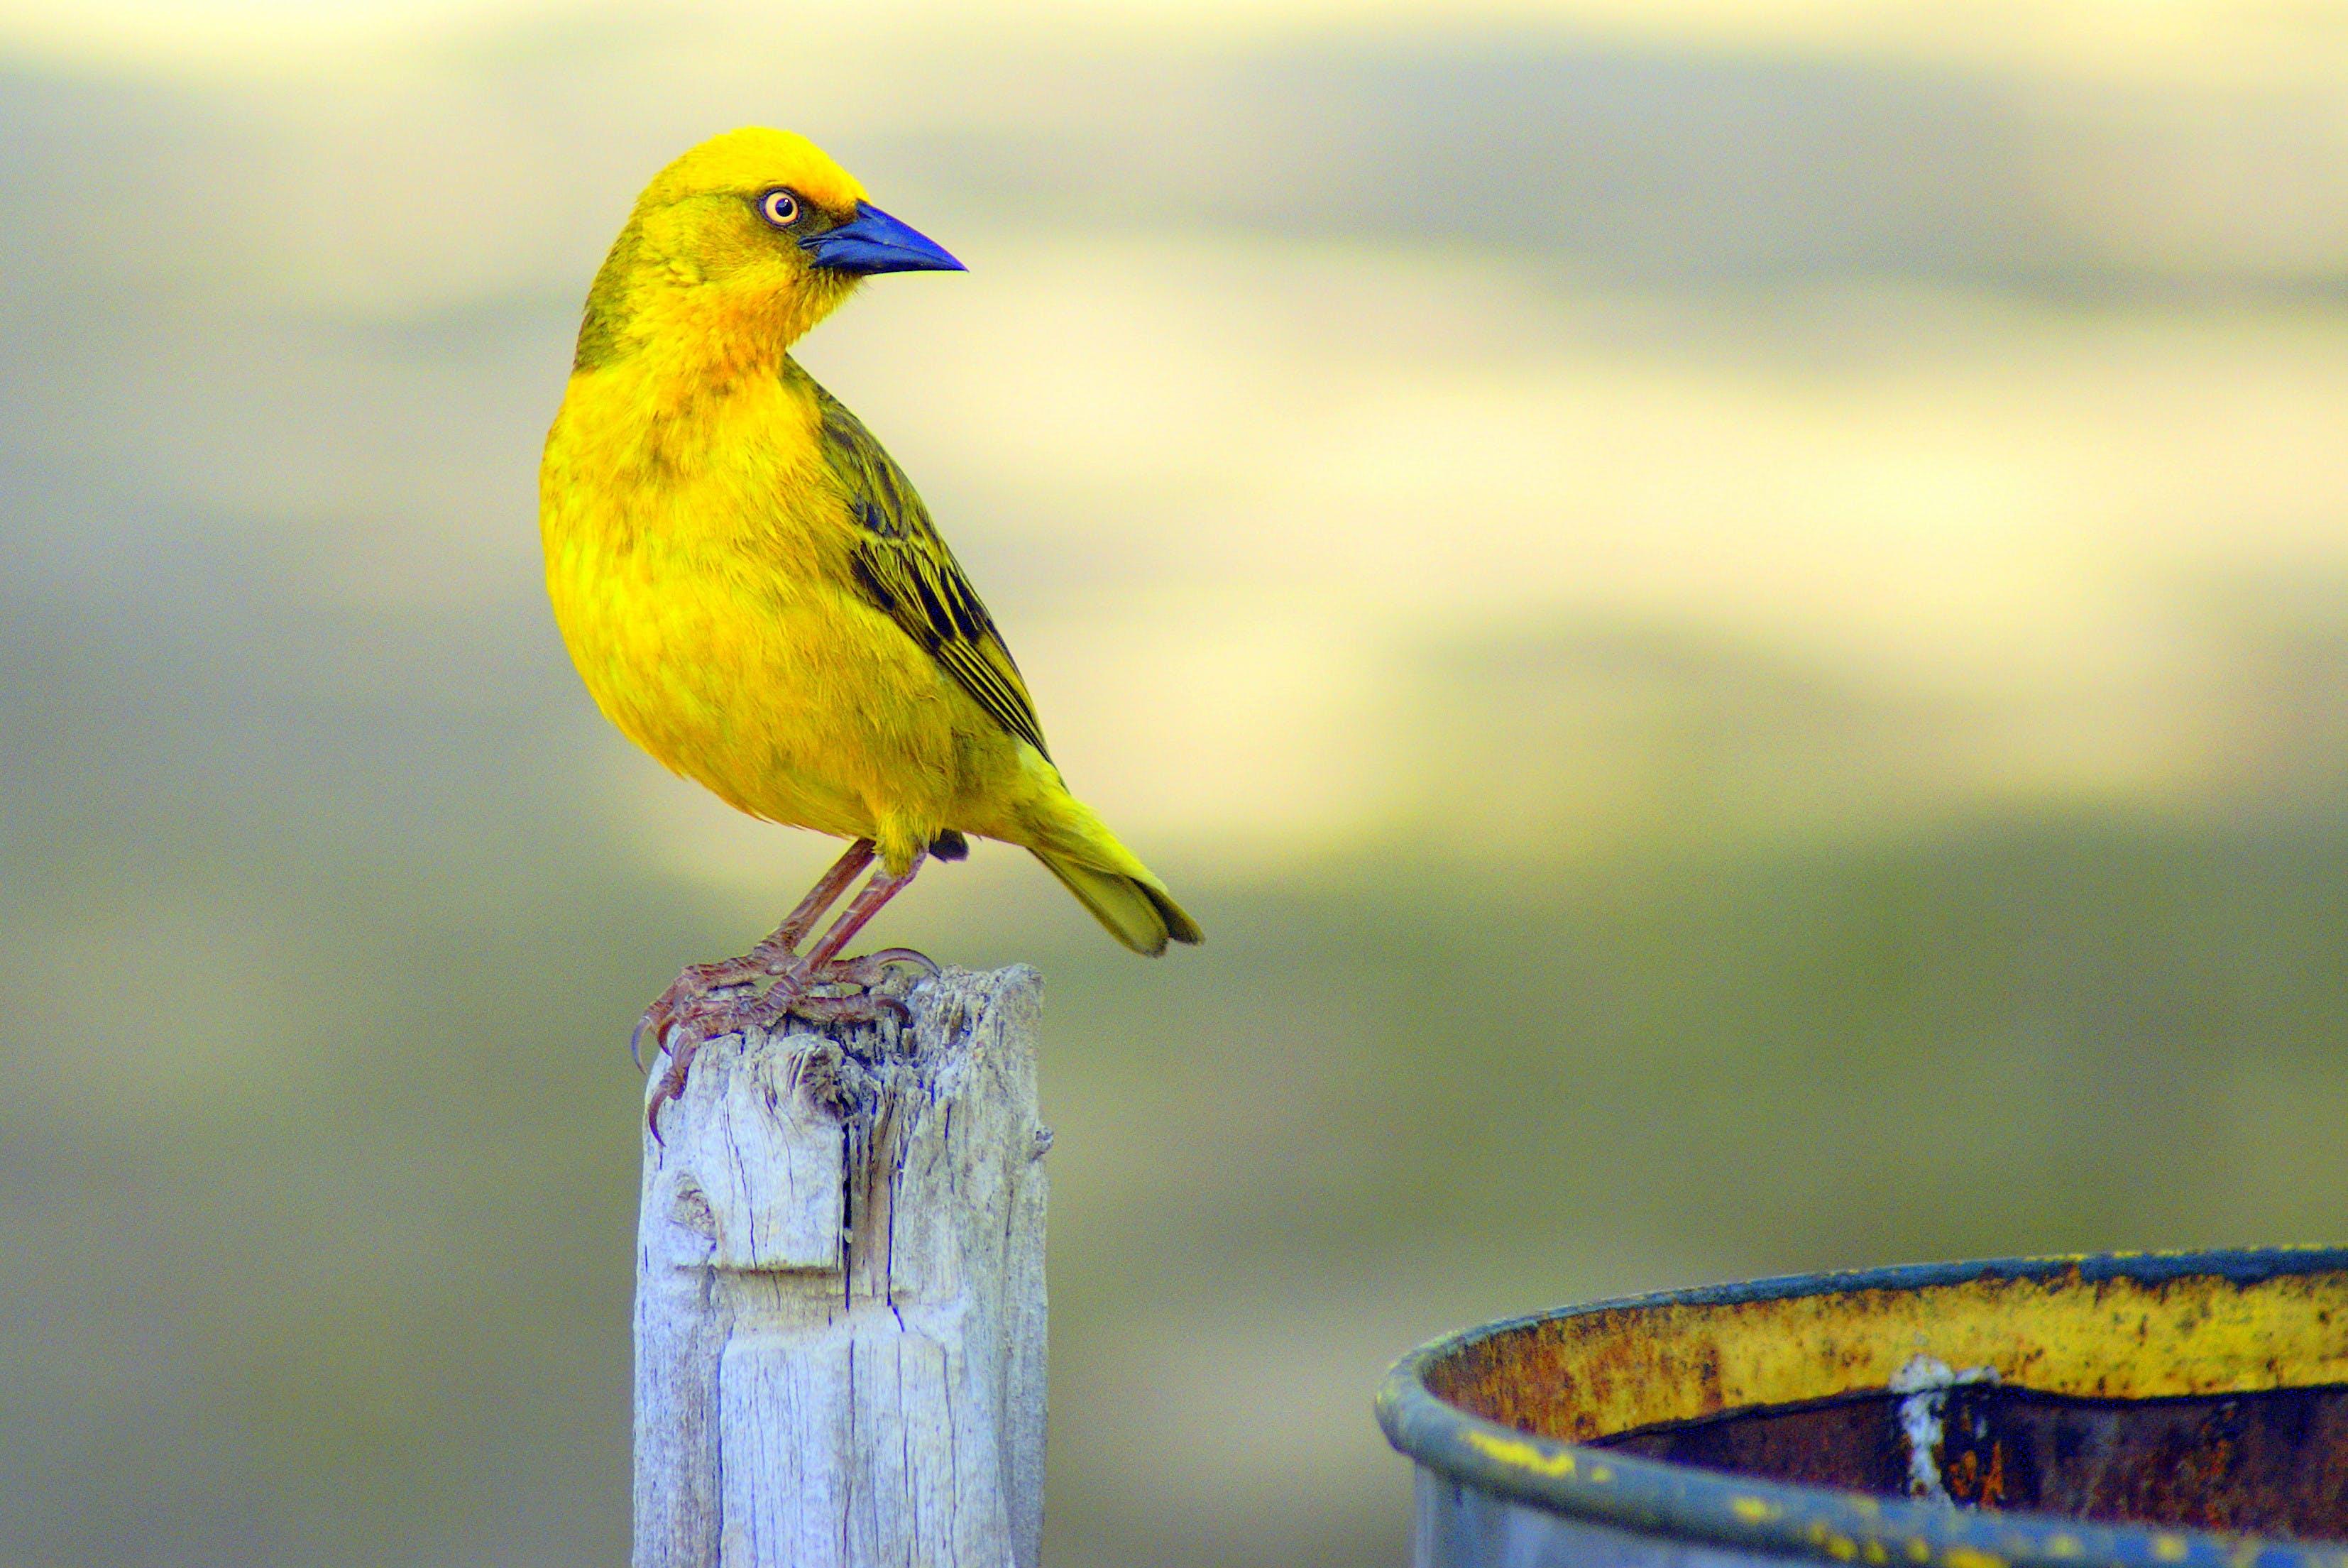 Focal Focus Photography of Perching Yellow and Blue Short-beak Bird